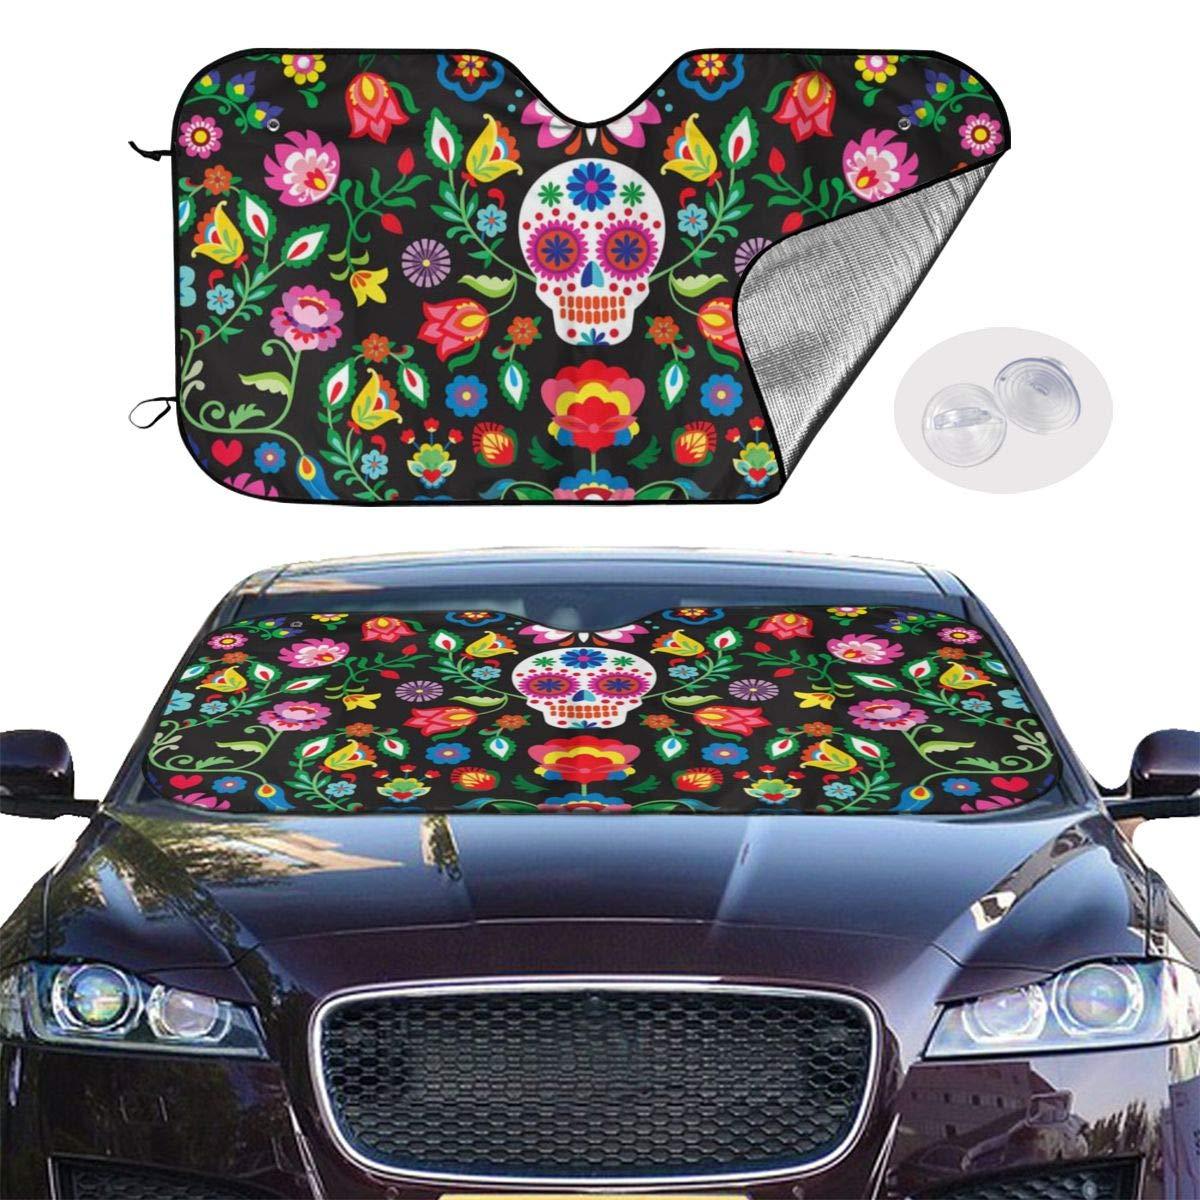 Yuk1no Foldable Car Windshield Sunshade,Shade UV Protection Keep Vehicle Cool,Fits Windshields of Most Sizes